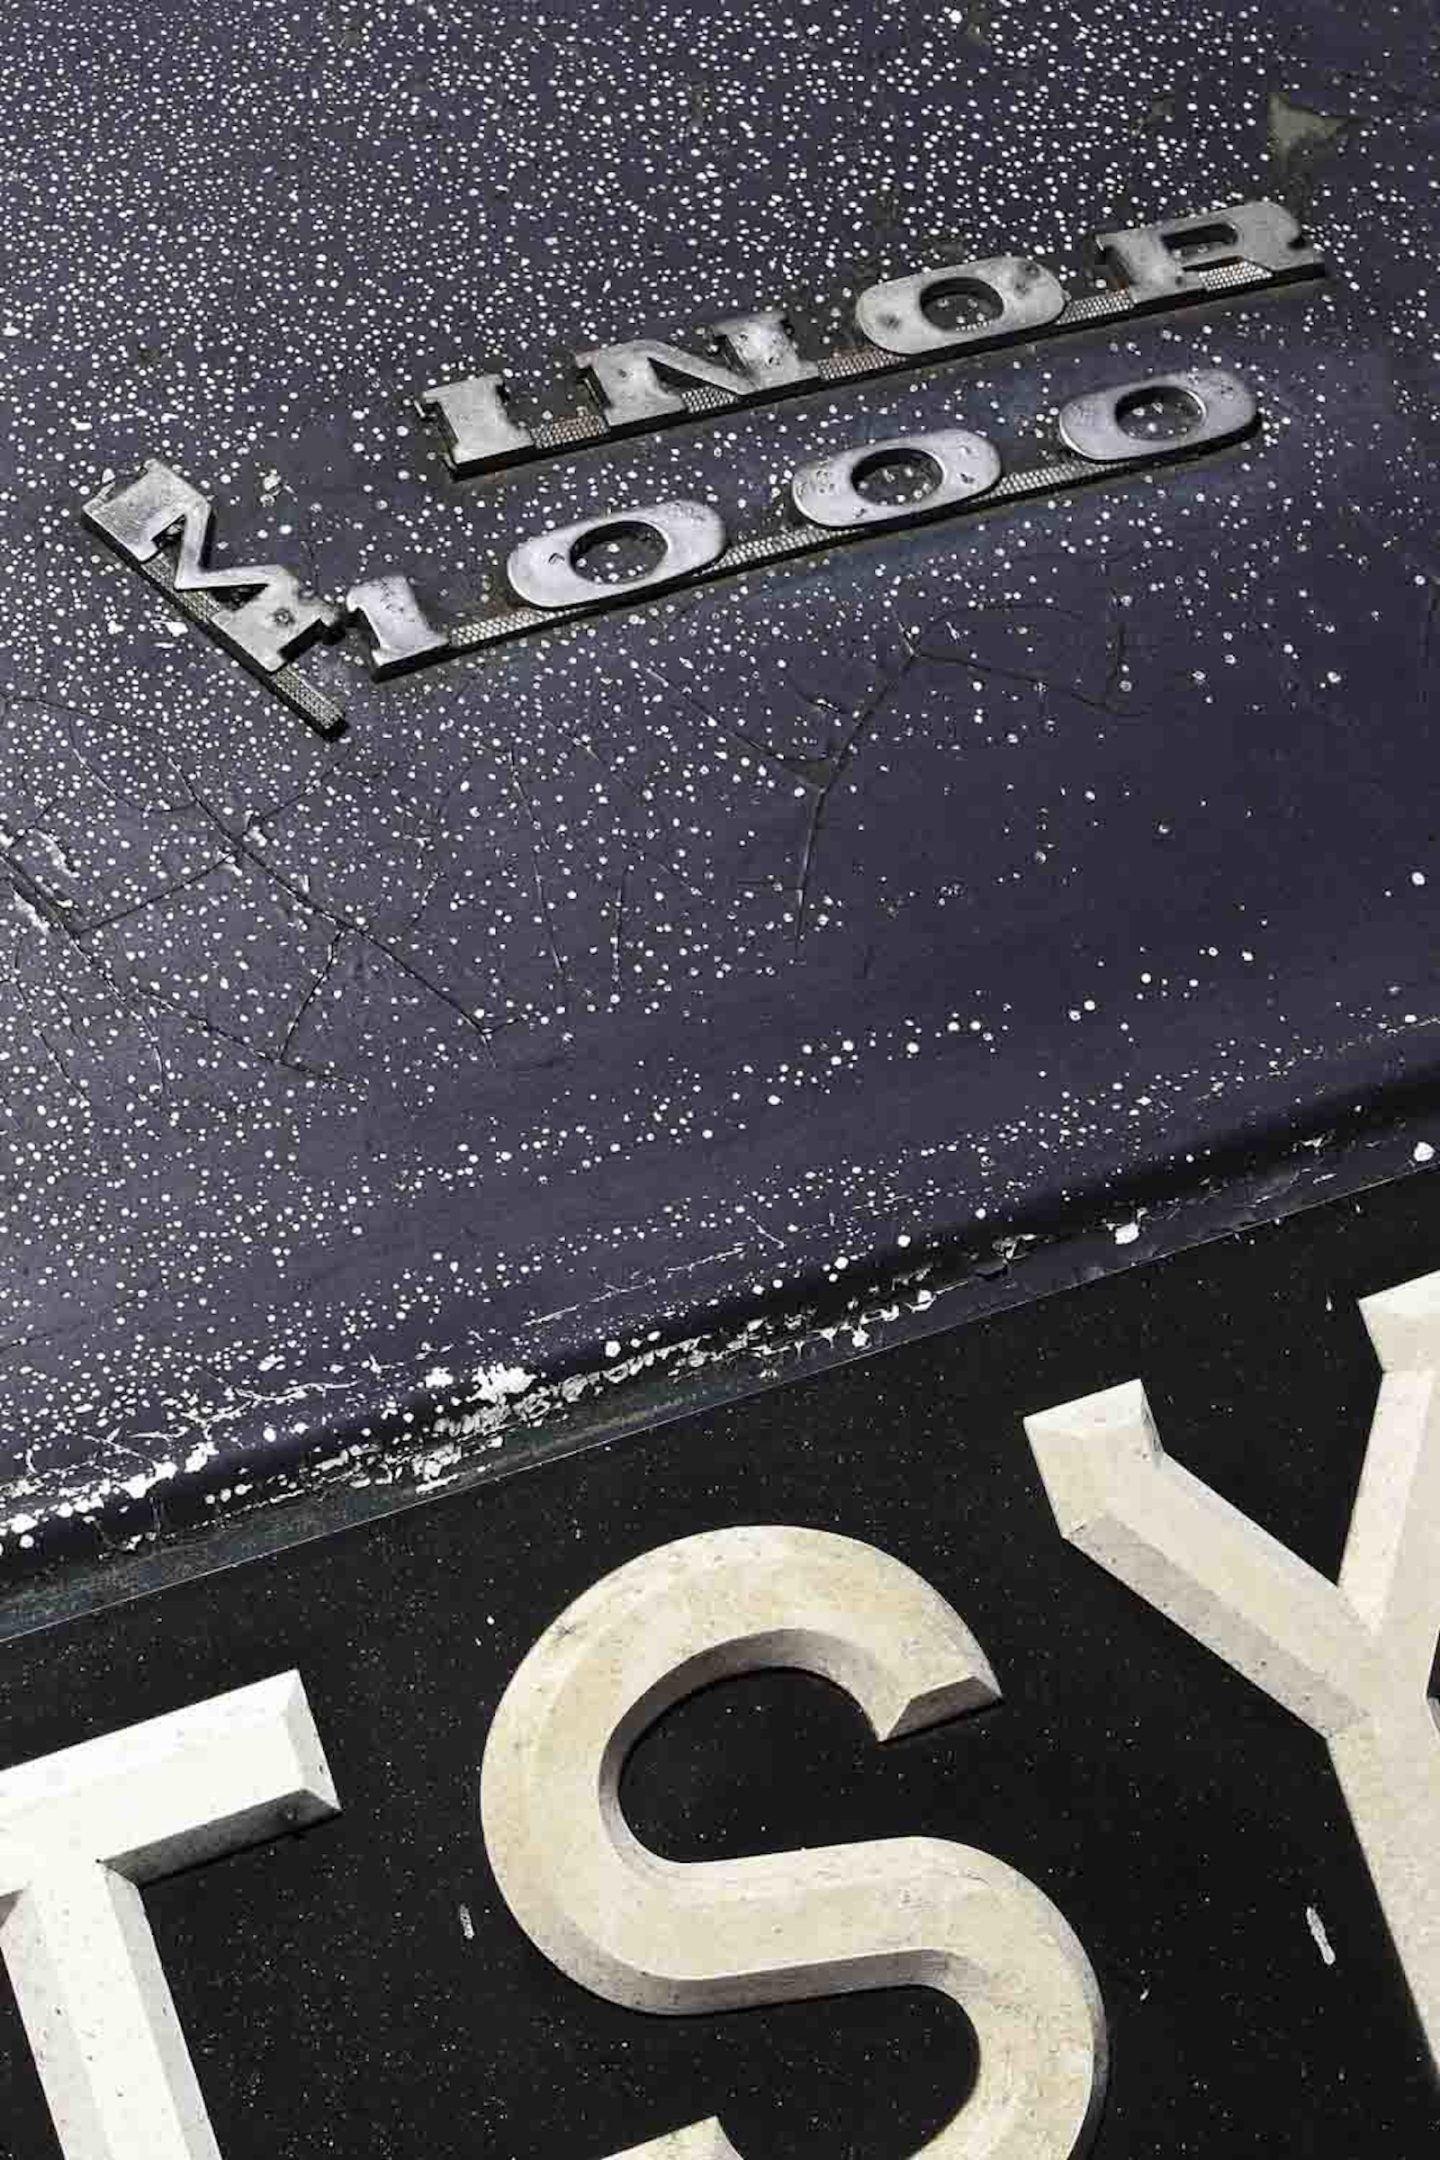 IGNANT-Print-Ronni-Campana-Badly-Repaired-Cars-014